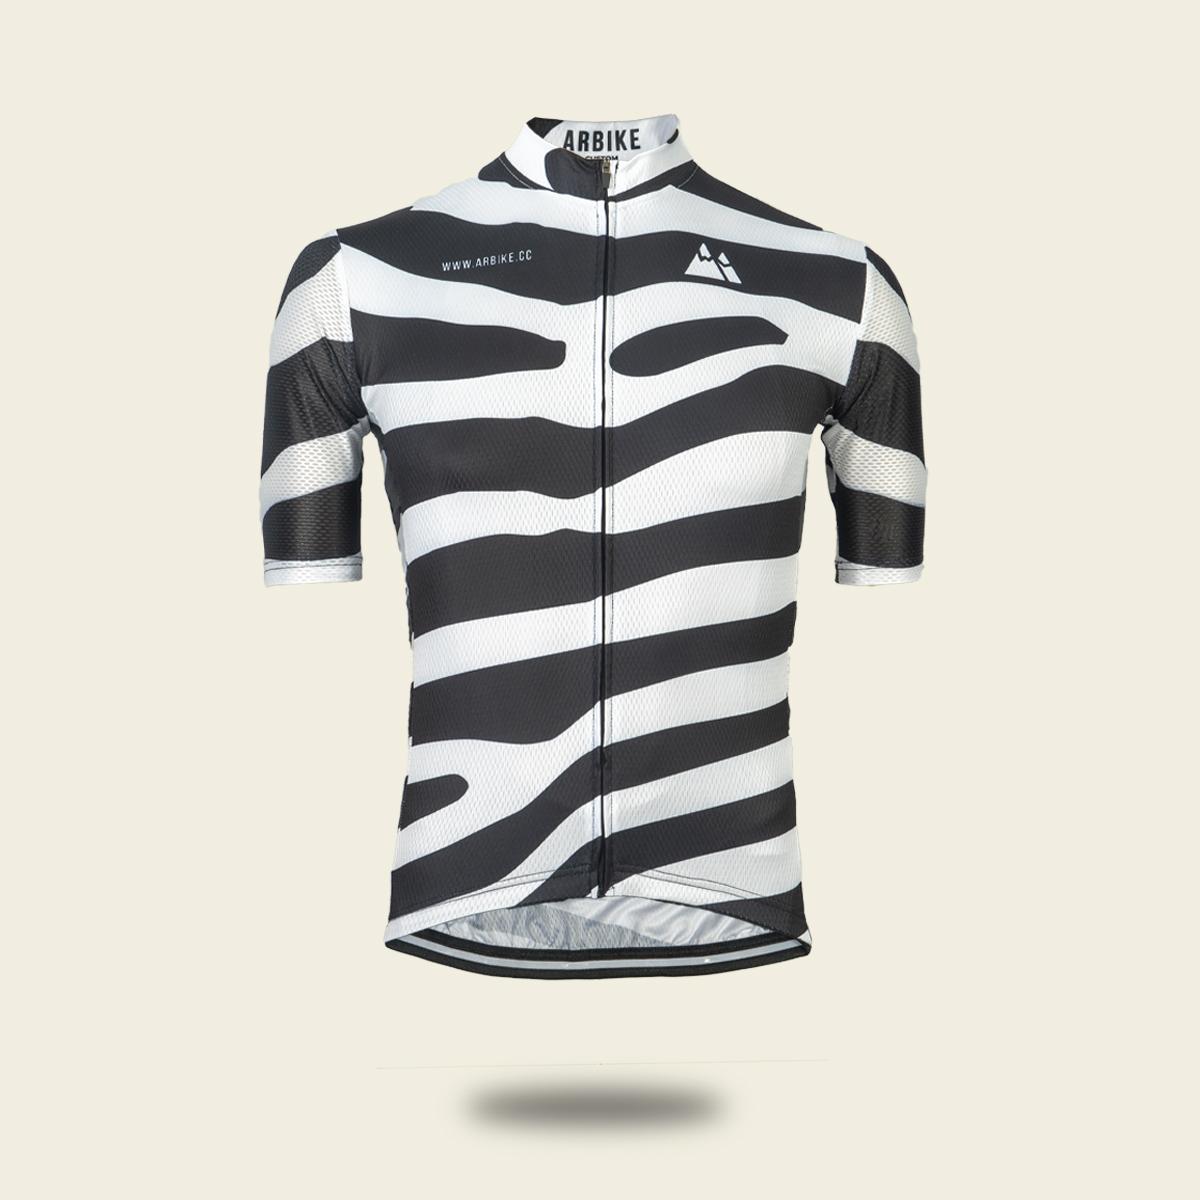 maillot zebra ciclismo carretera